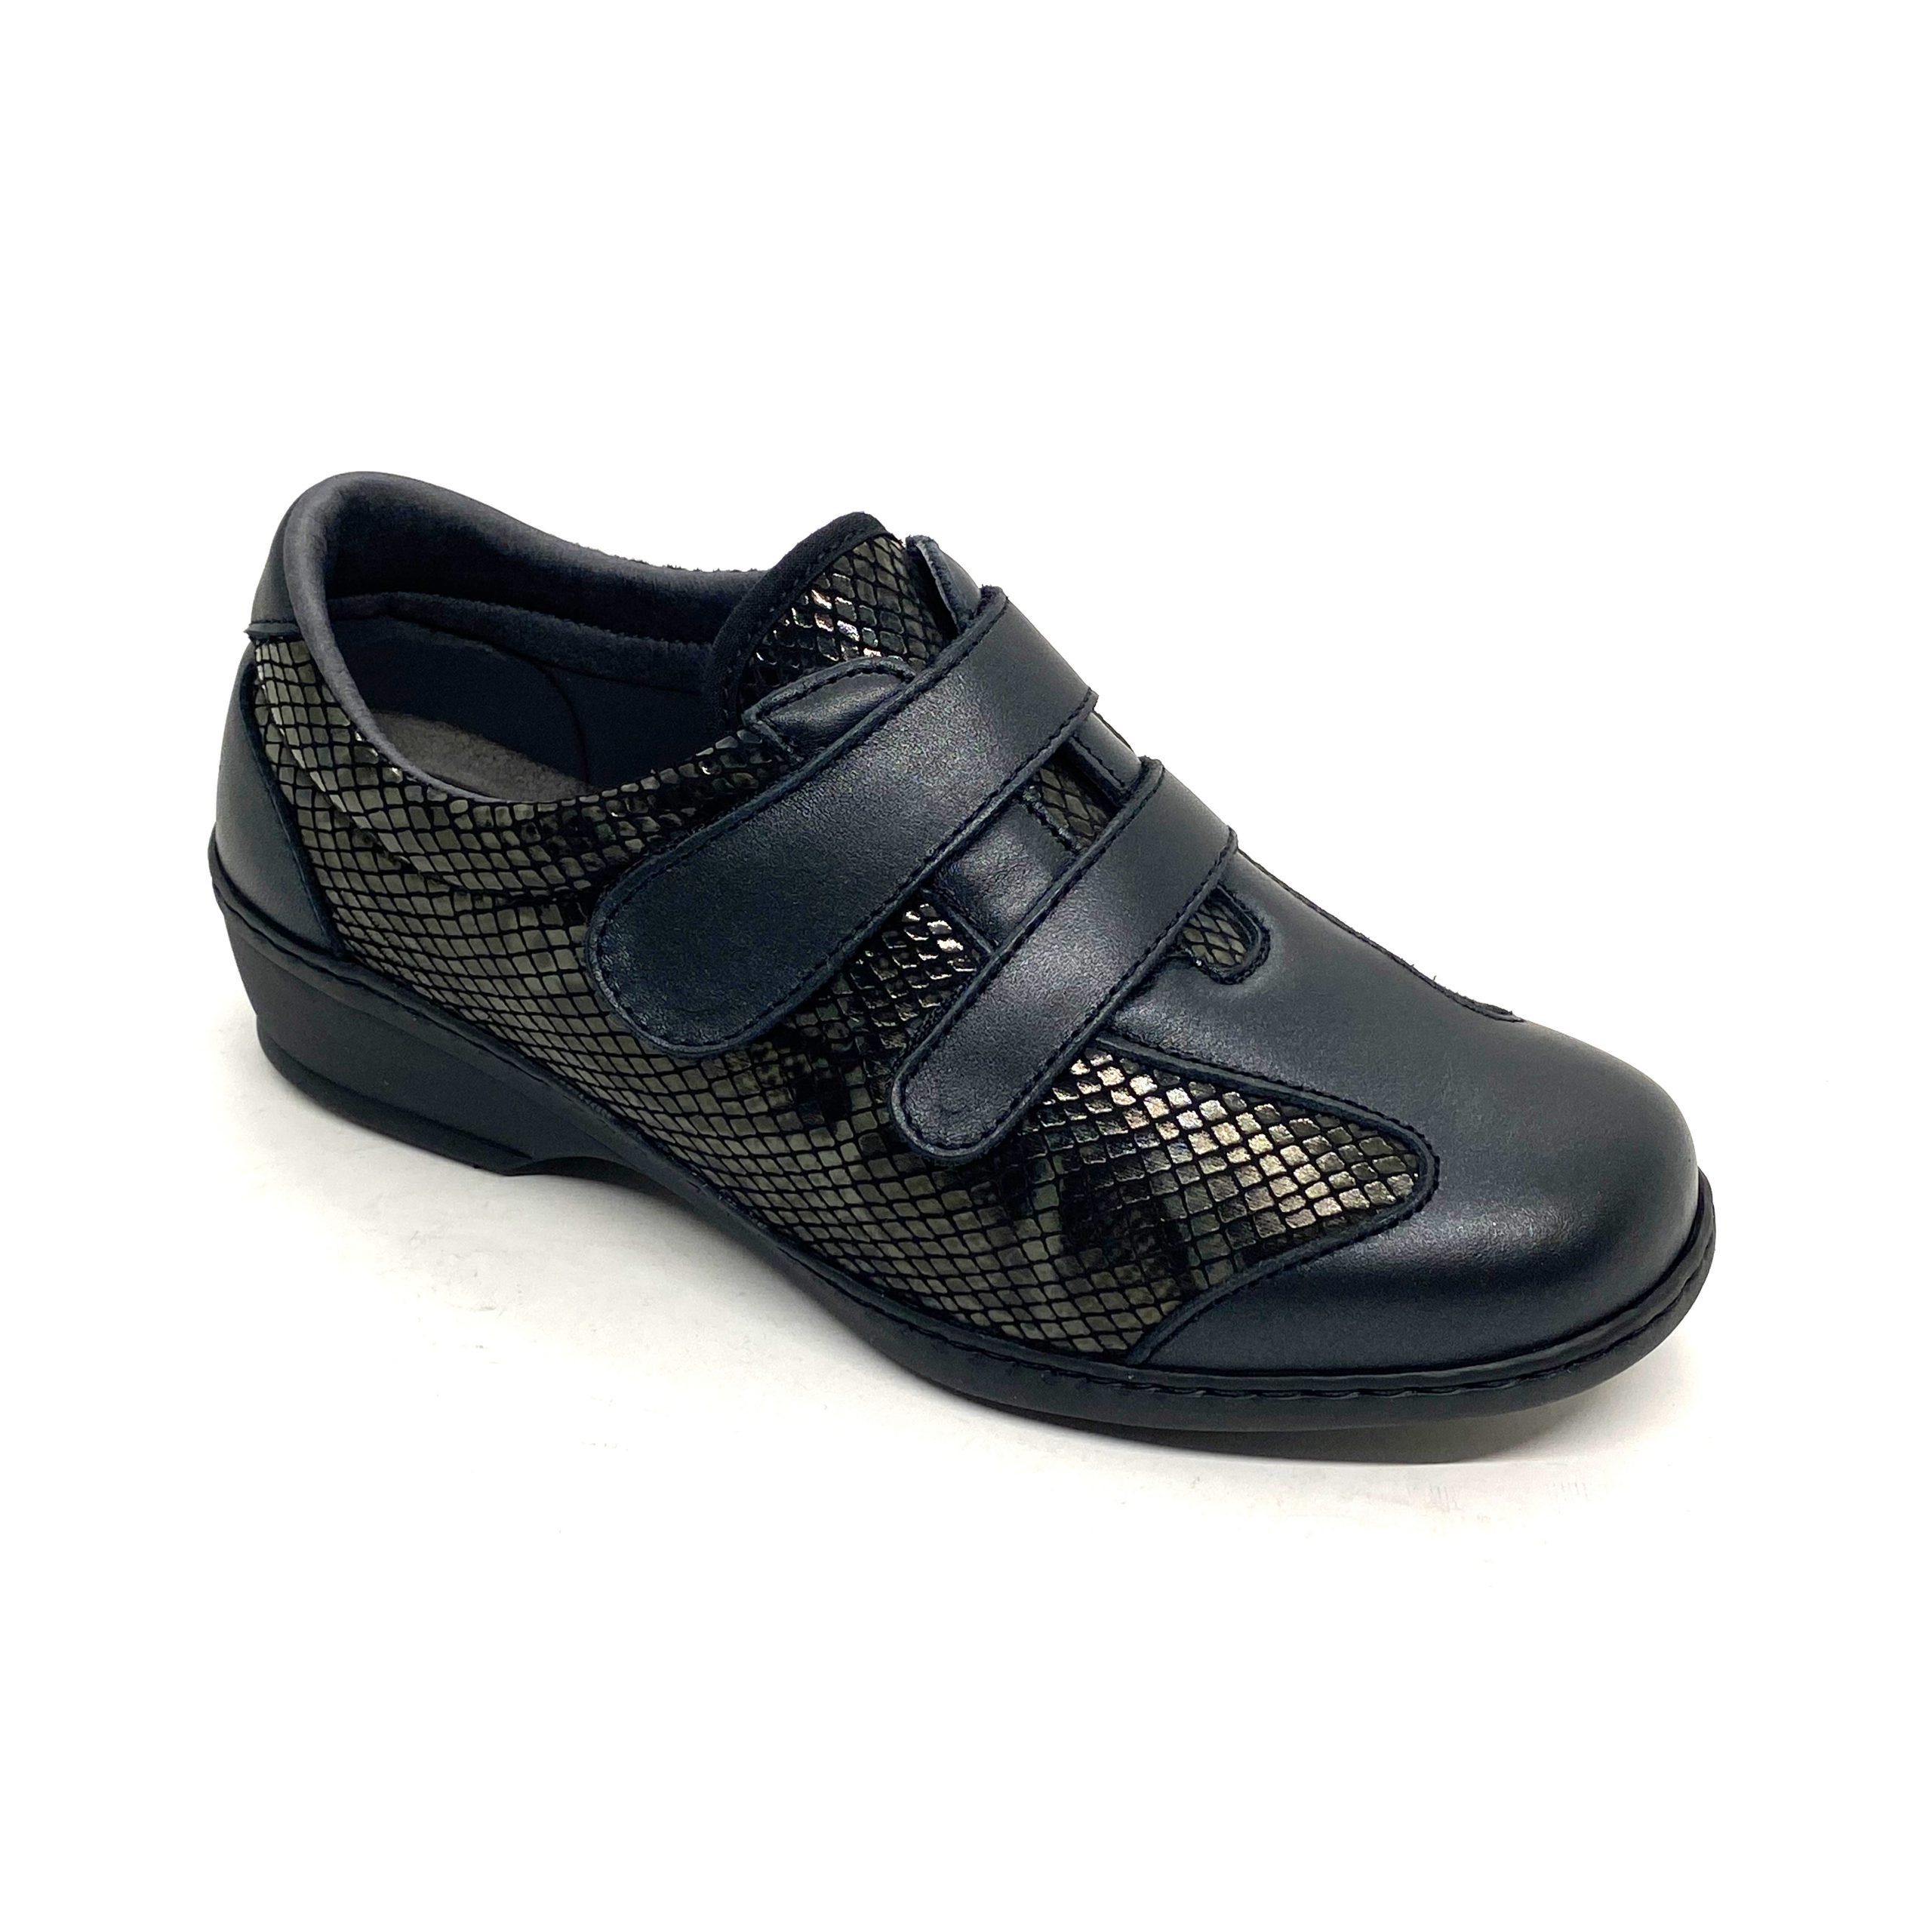 Notton Velcro 2369